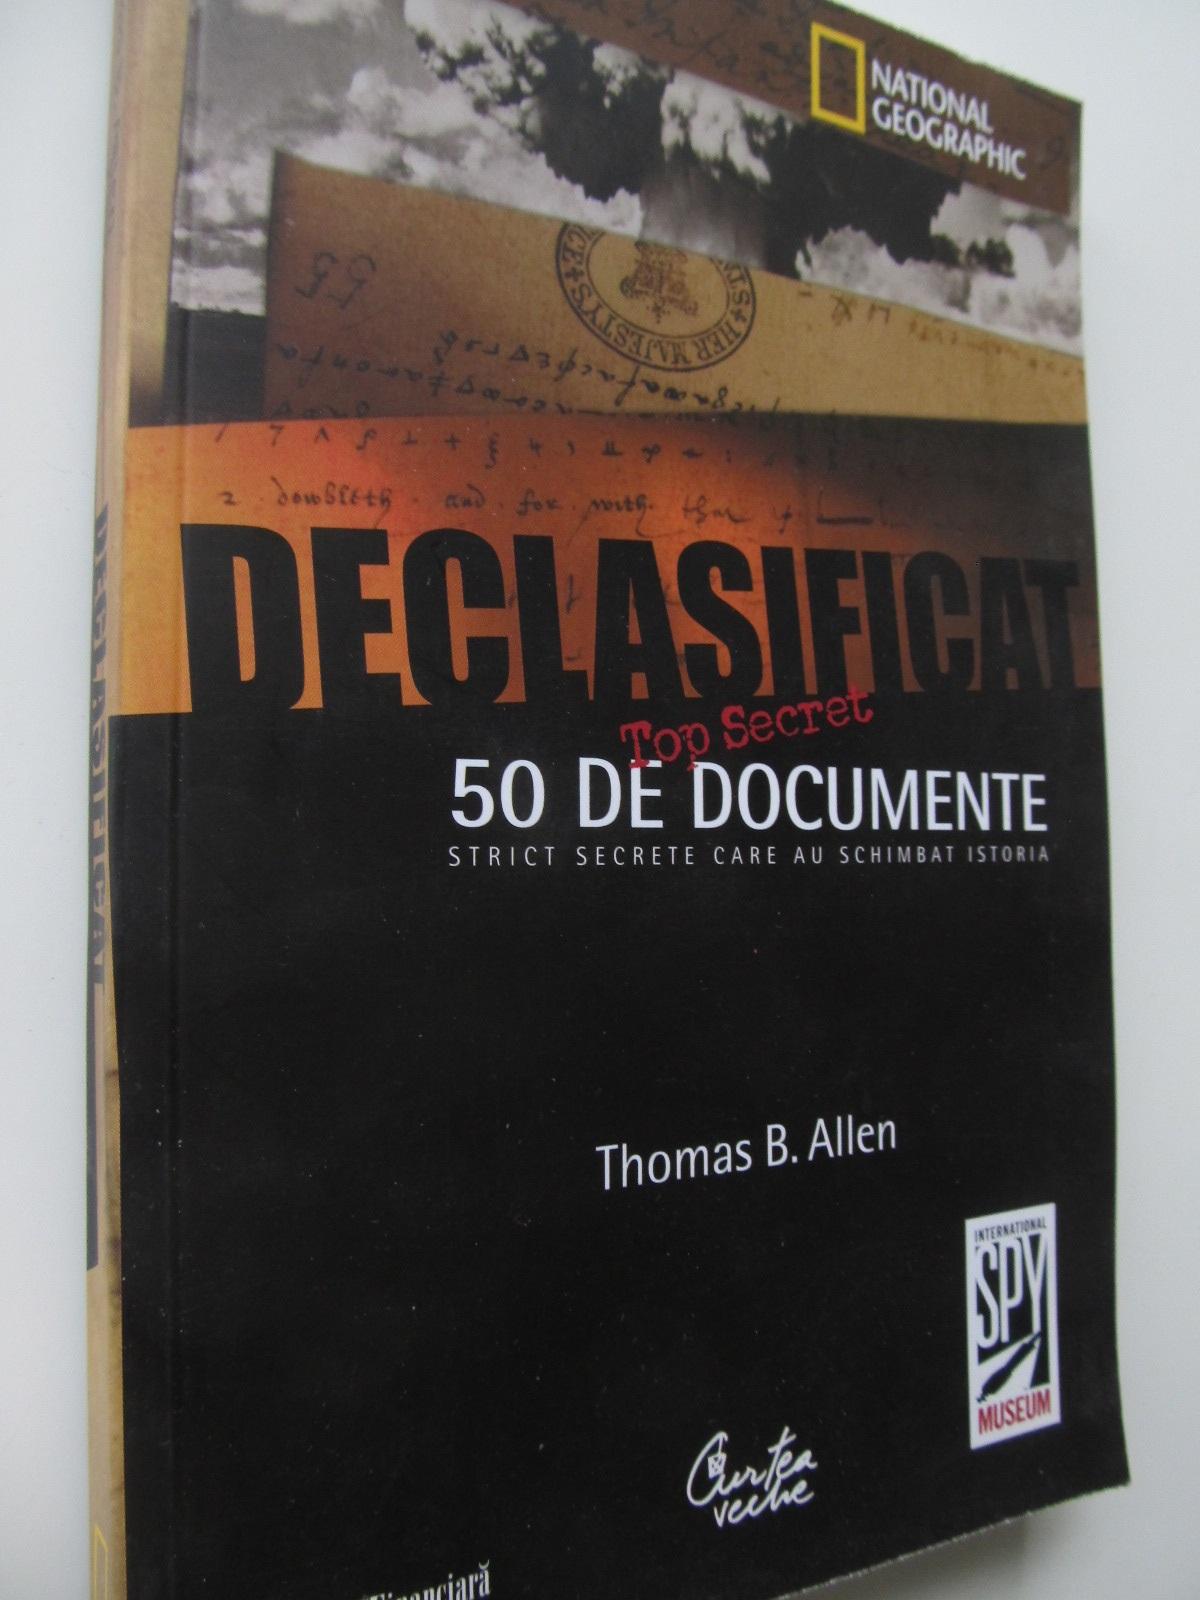 Declasificat 50 de documente strict secrete care au schimbat istoria - Thomas Allen | Detalii carte